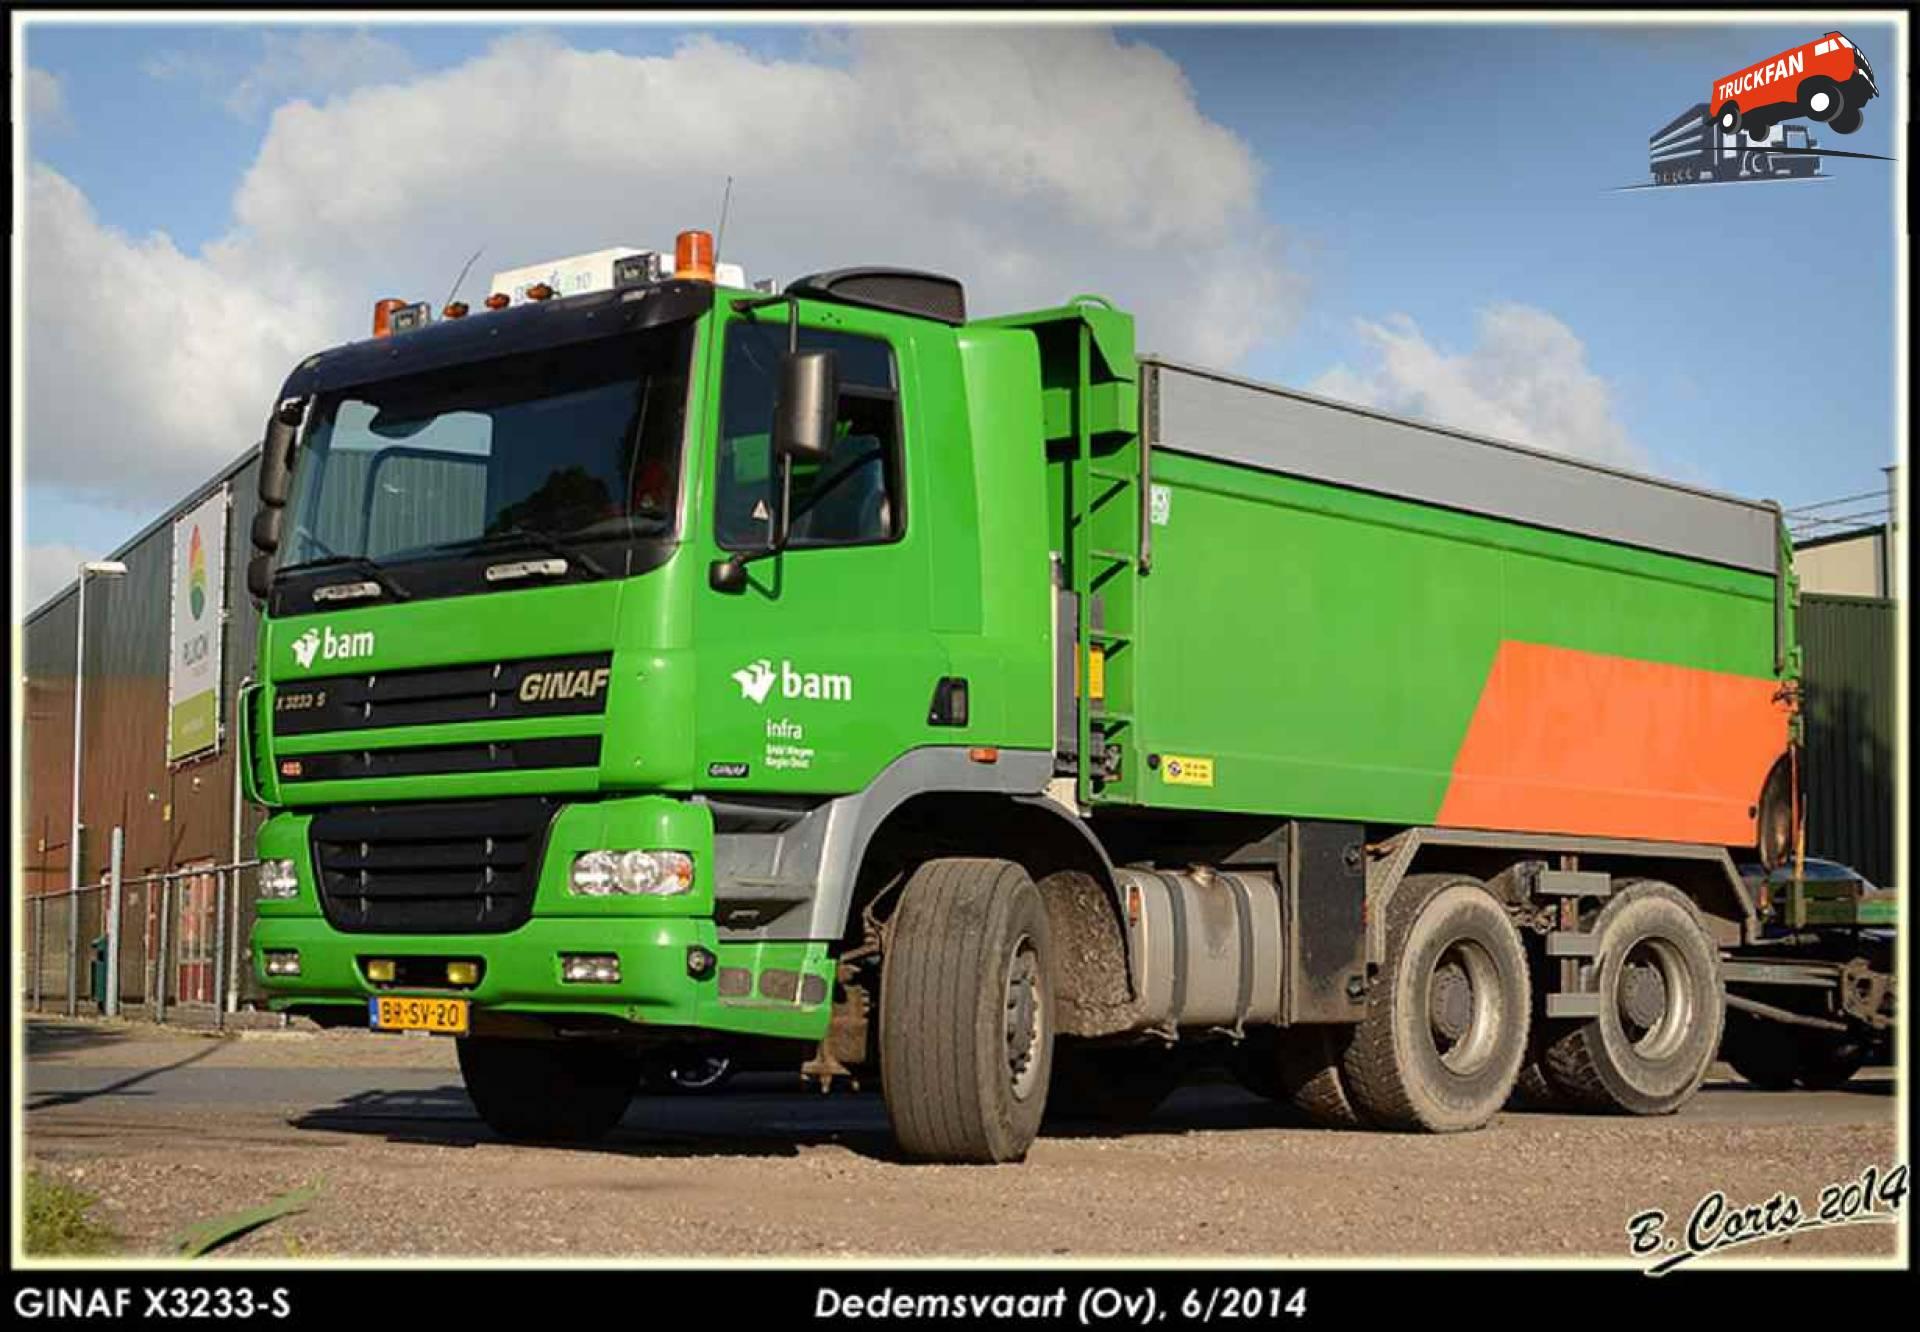 GINAF X3233-S